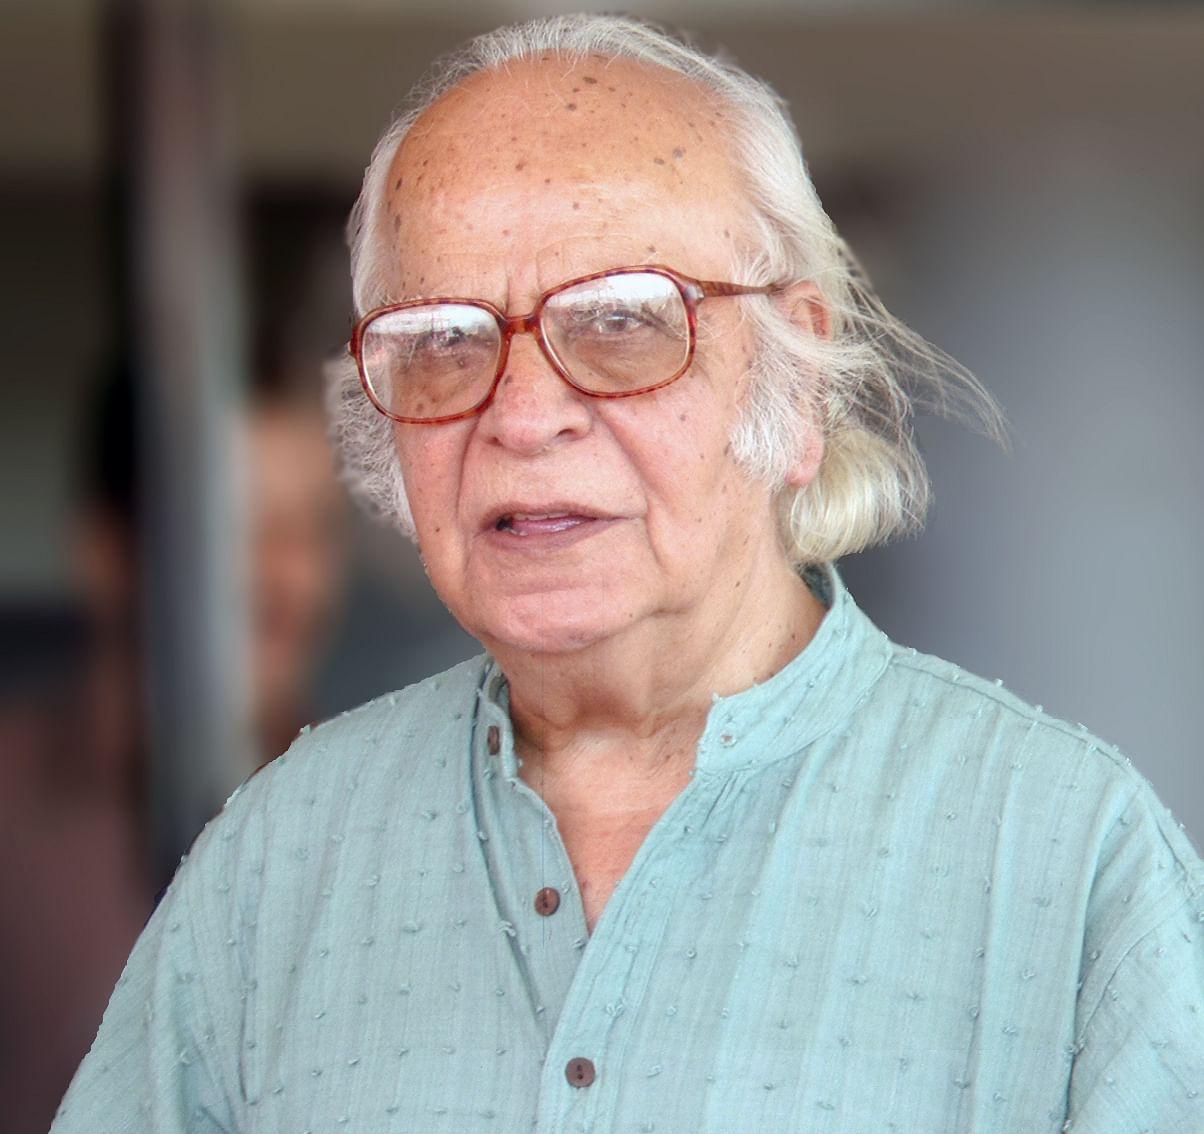 Professor Yash Pal (Source: Wikimedia Commons)